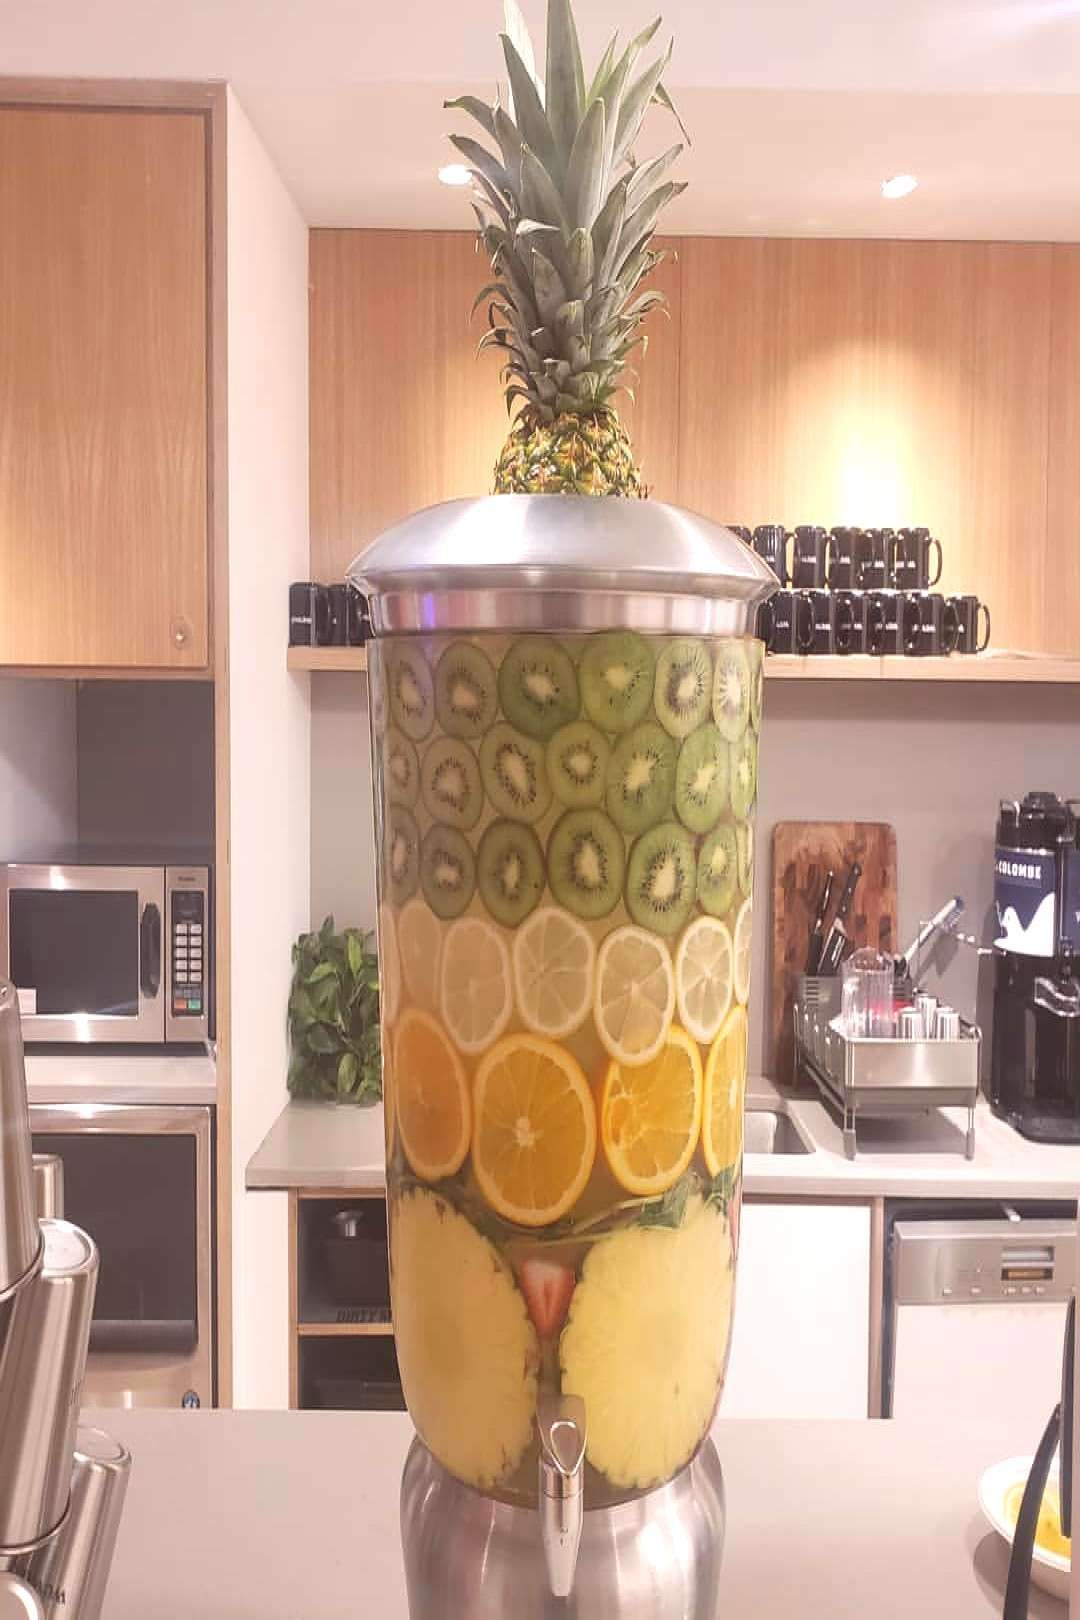 #healthyliving #fruitwater #rawfoods #healthy #indoor #fruit #water #nat  #fruit #water #fruitwater #healthy #healthyliving #rawfoods #natYou can find Drink water and more on our website. #fruit #water #fruitwater #healthy #healthyliving #ra...